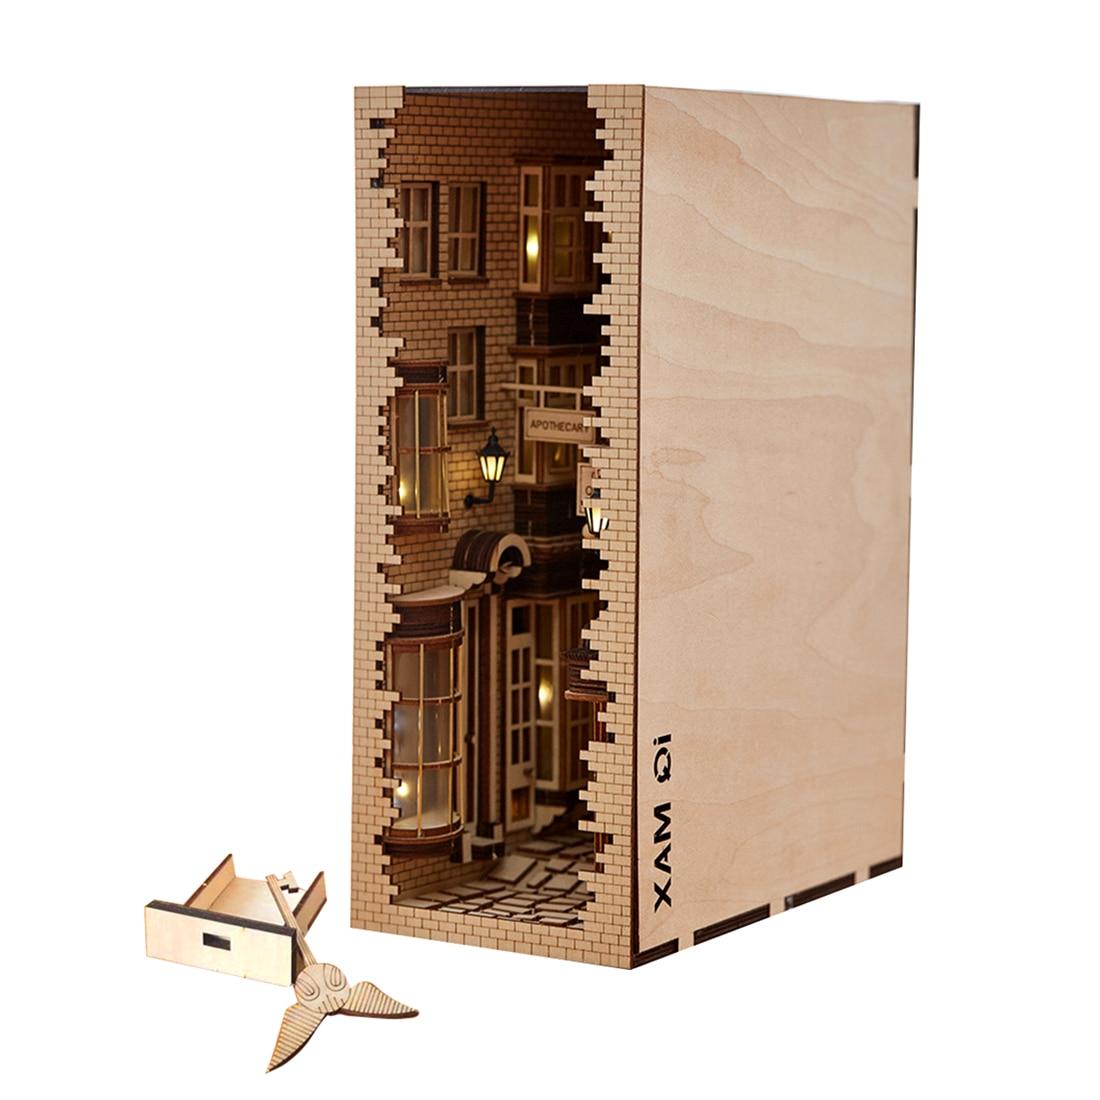 Japanese Style Street Rear Lane Bookcase 3D DIY Wooden Assembled Model Bookshelf - New London Lane + Tool Kit